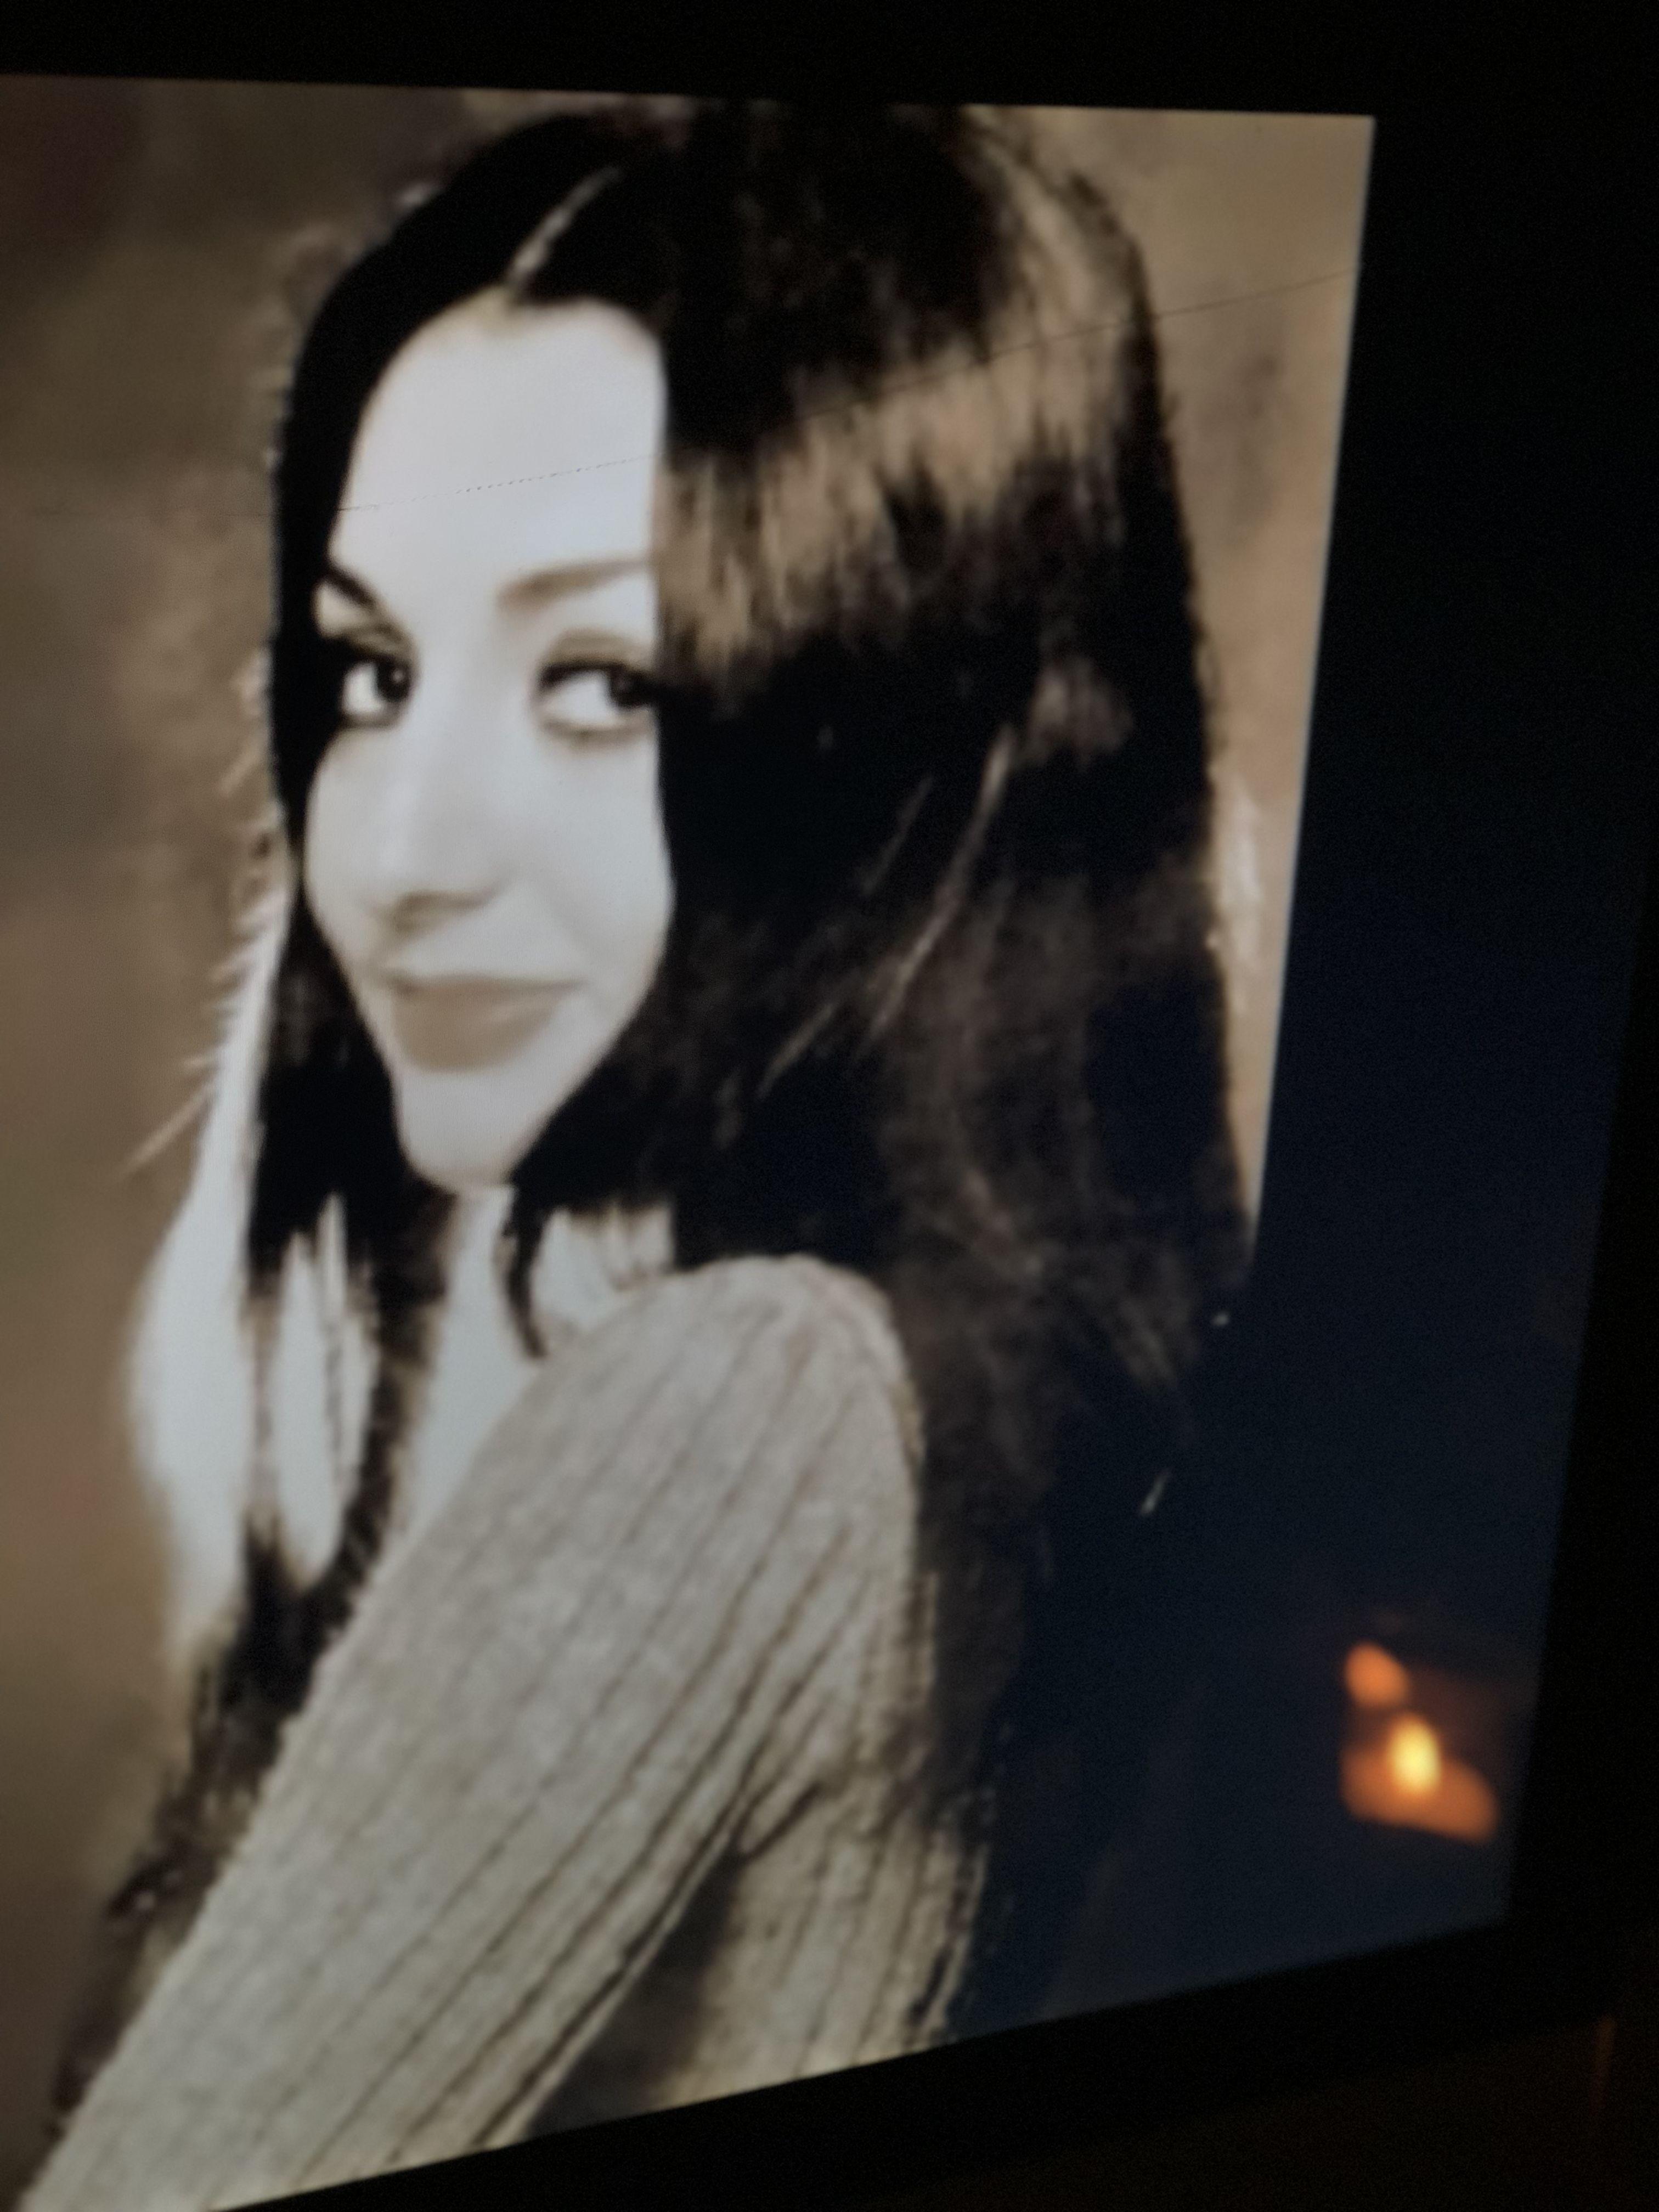 گوگوش واسمها الحقيقي فائقه آتشین 5 مايو 1950 في طهران هي ممثلة